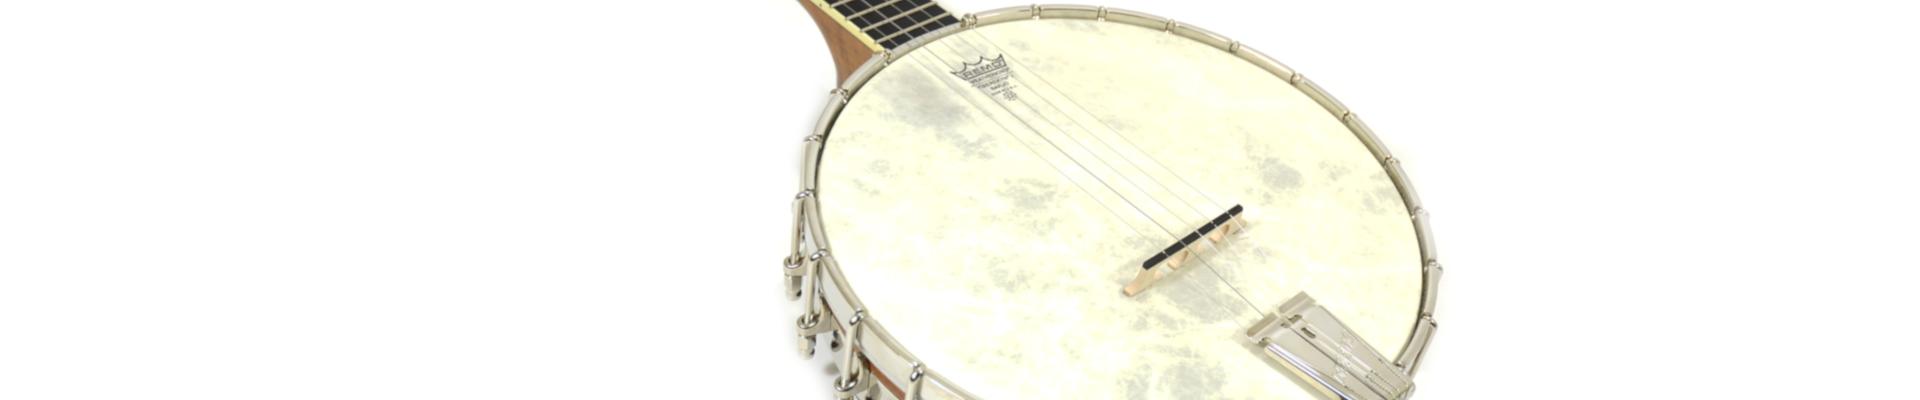 Banjo Head